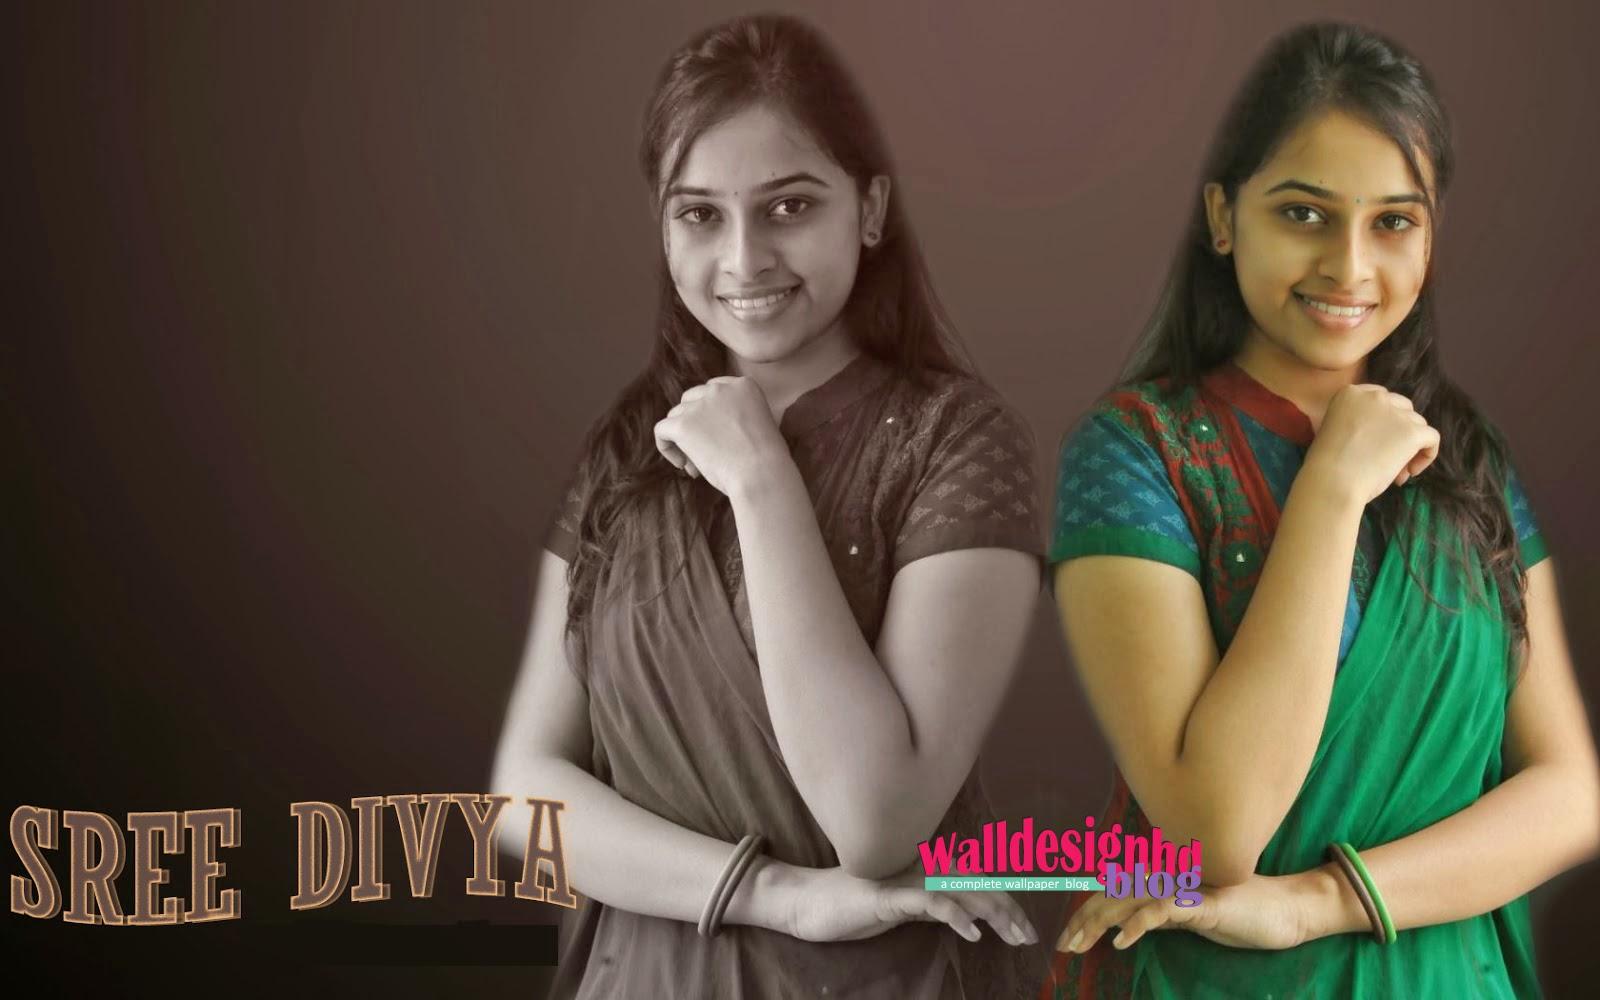 Wallpaper Hd Tamil Actress Sri Divya